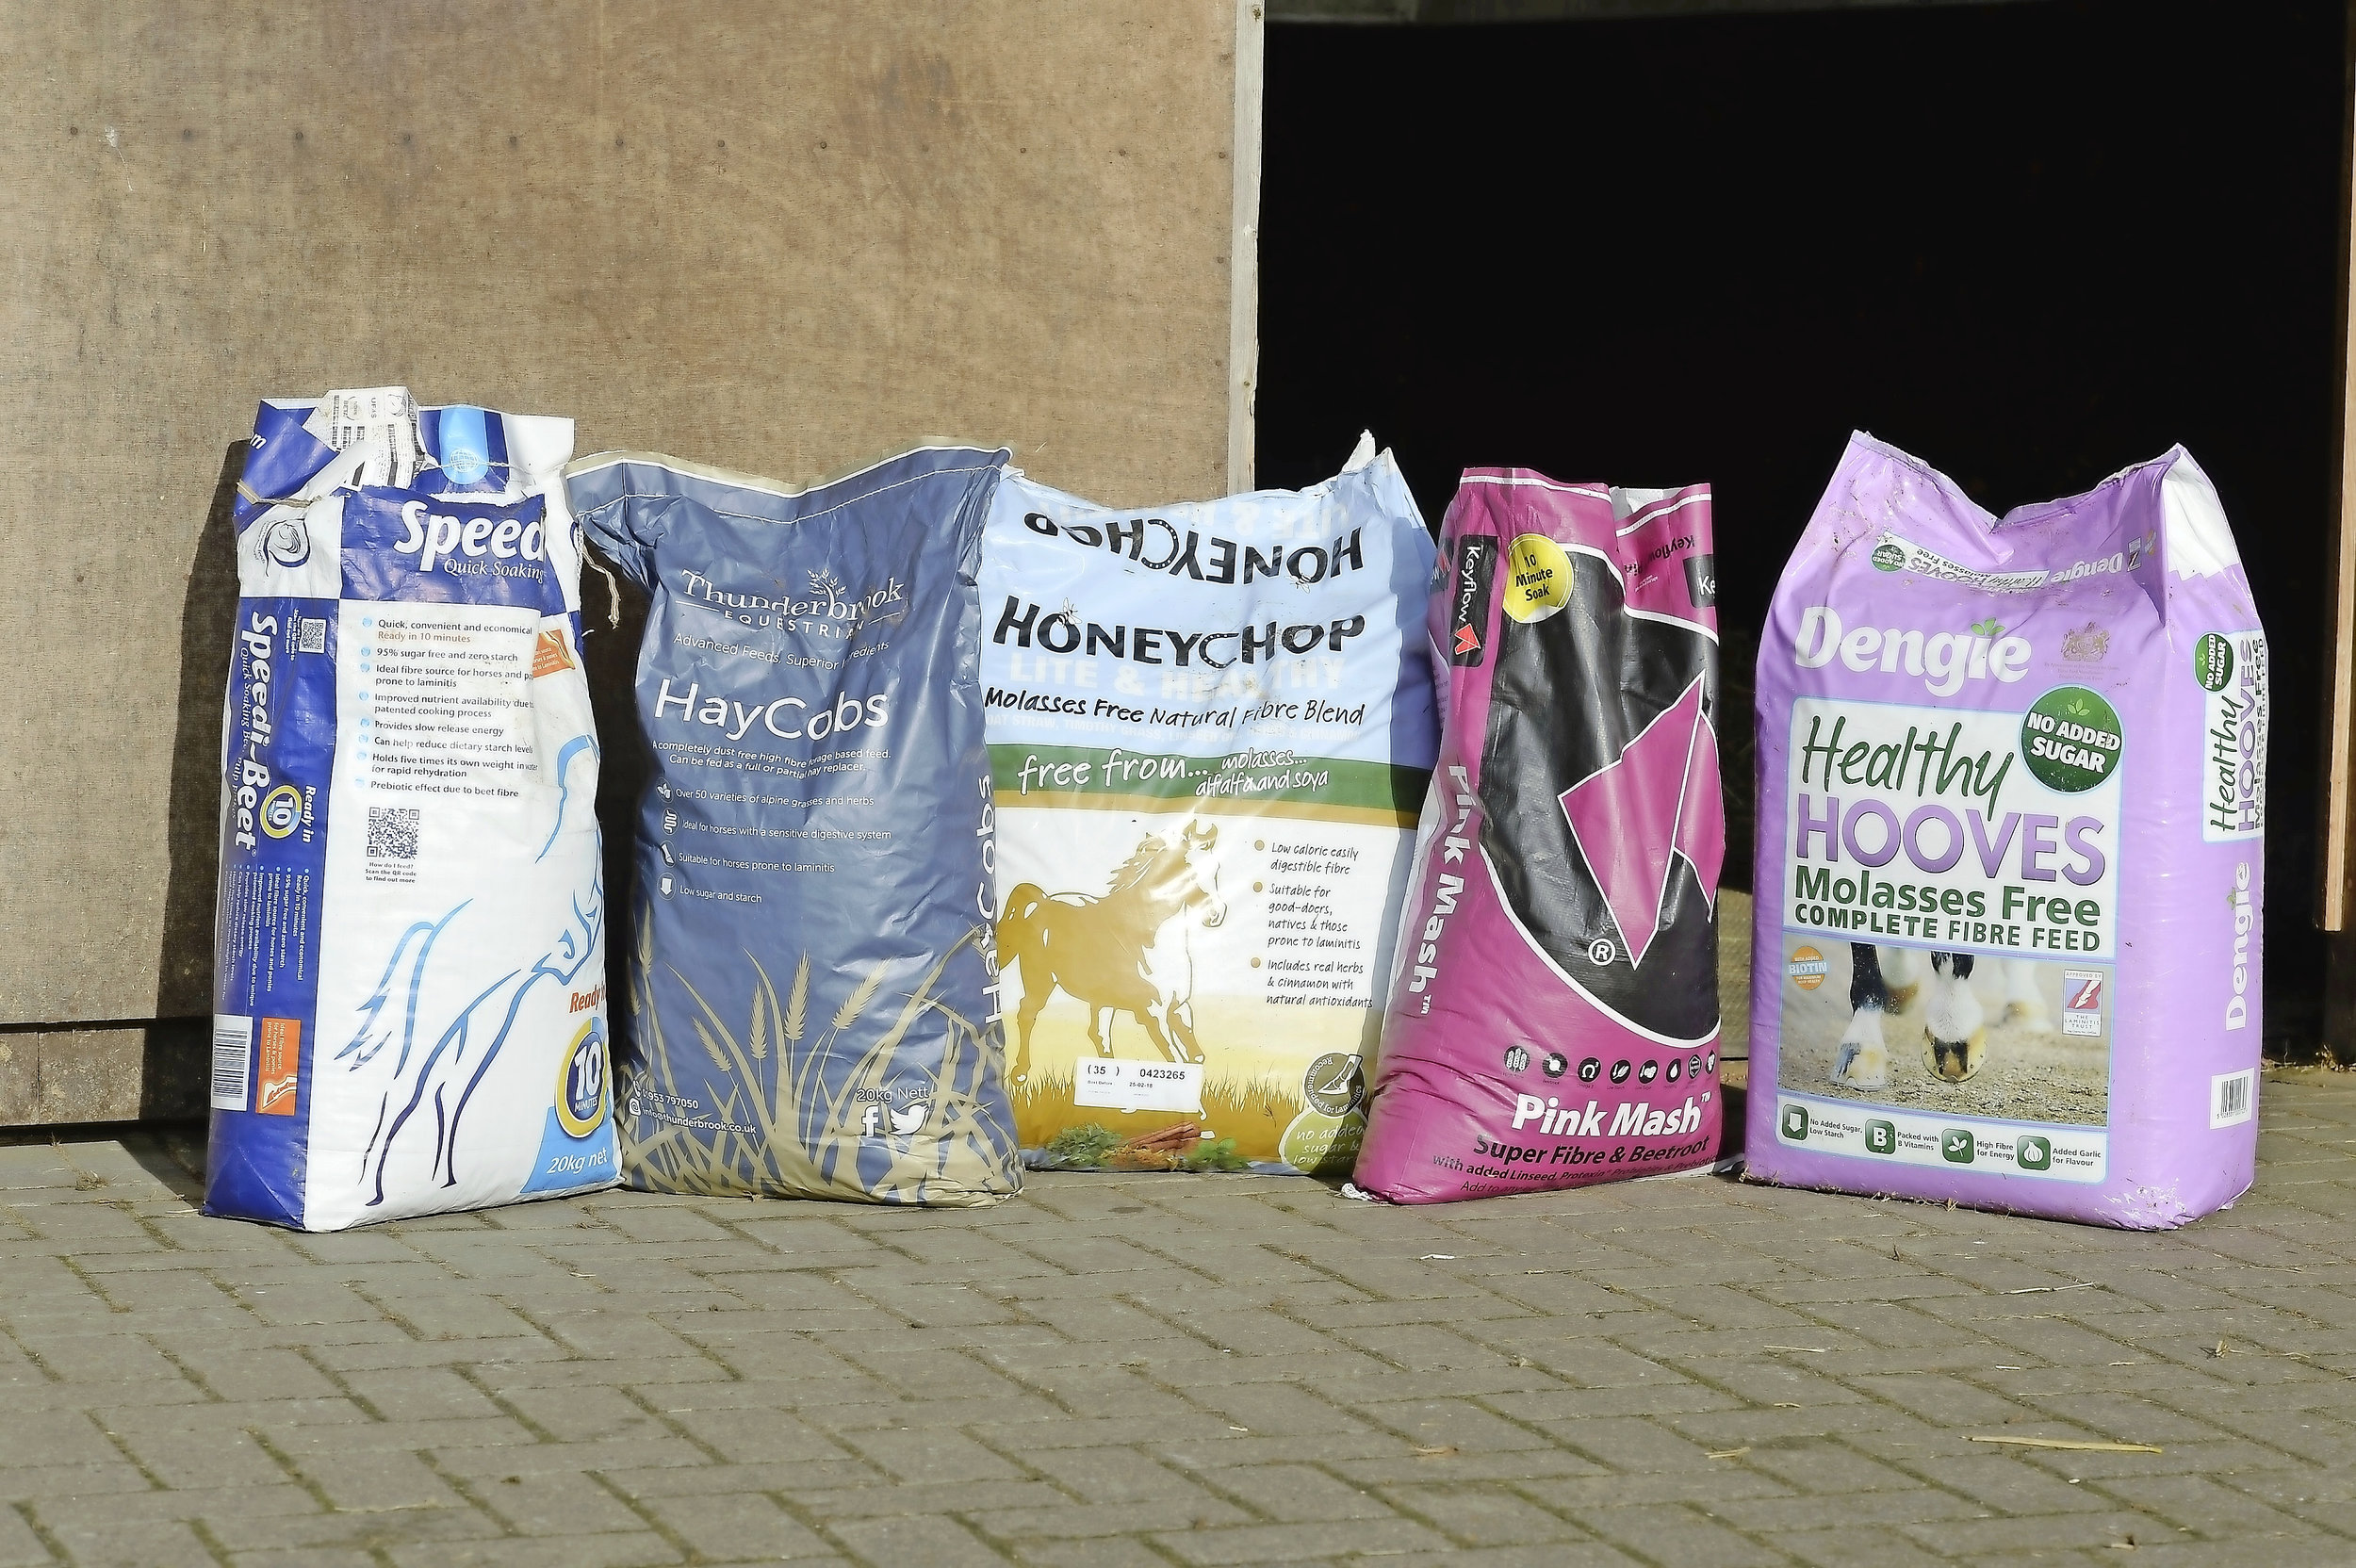 Low-sugar feed brands